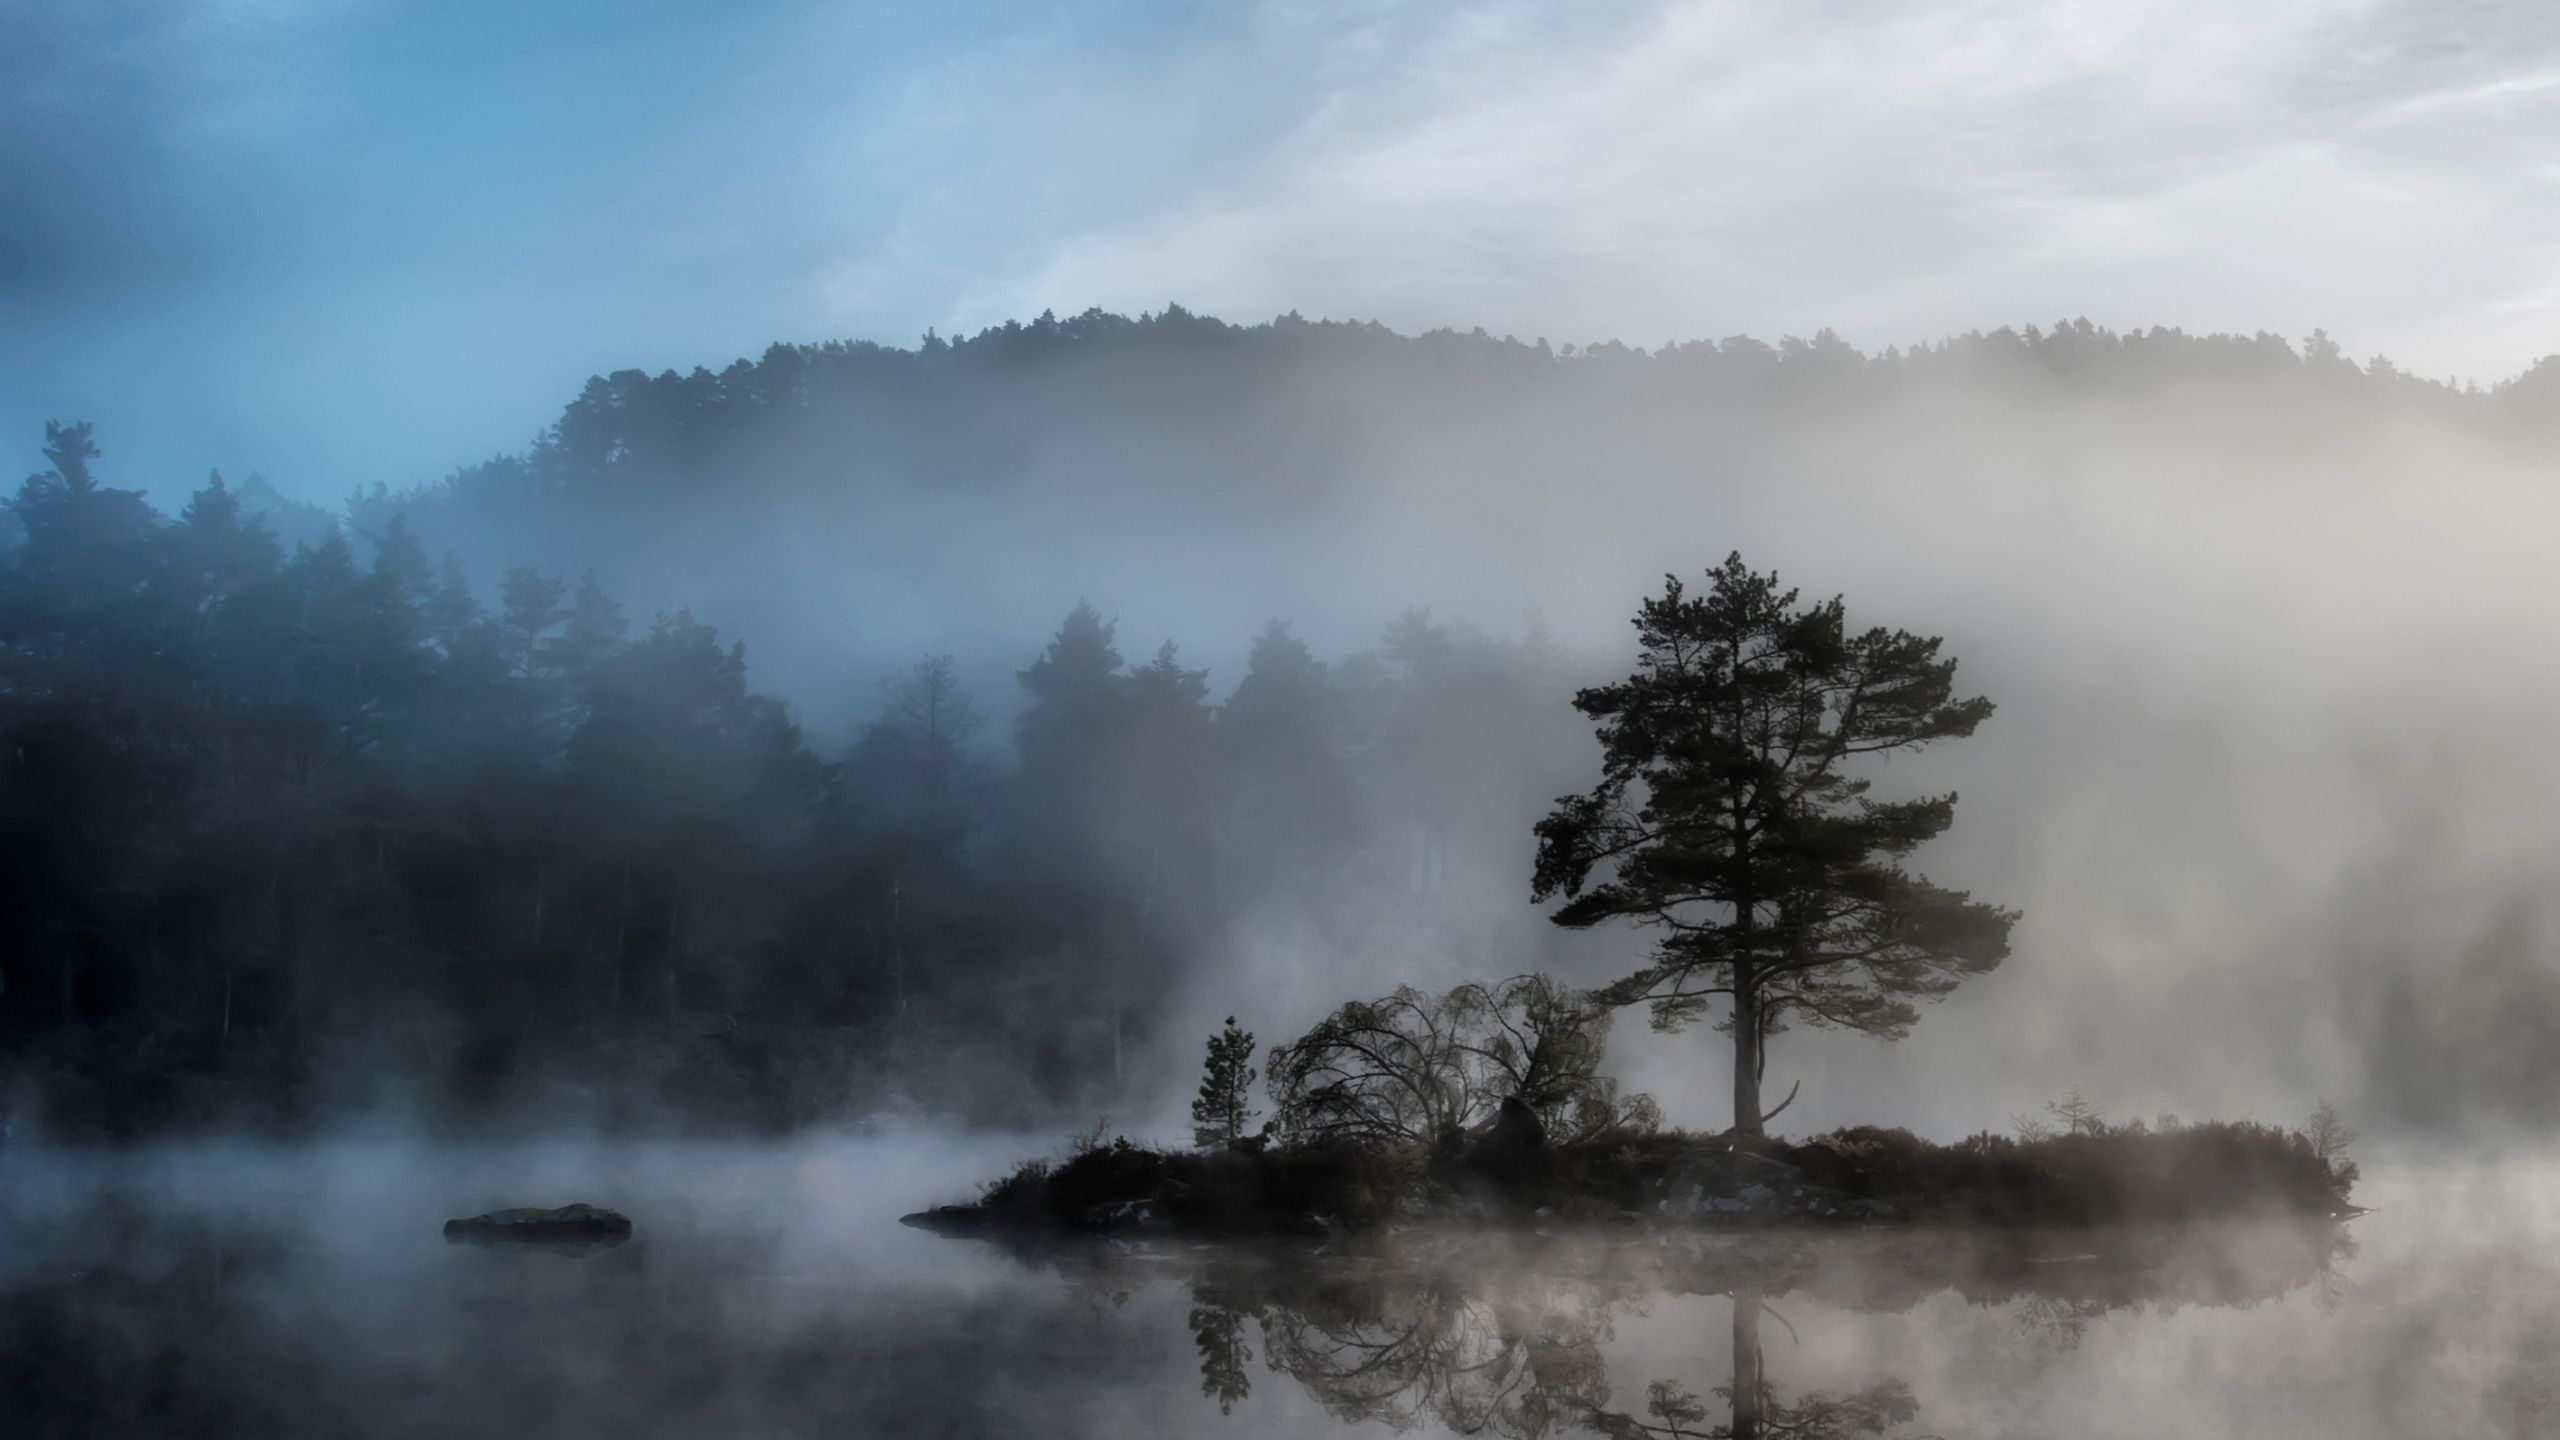 Tree Island Reservoir Fog Mysterious X Hd Wallpaper Fog Photography Landscape Scenery Picture Hd wallpaper morning lake trees fog